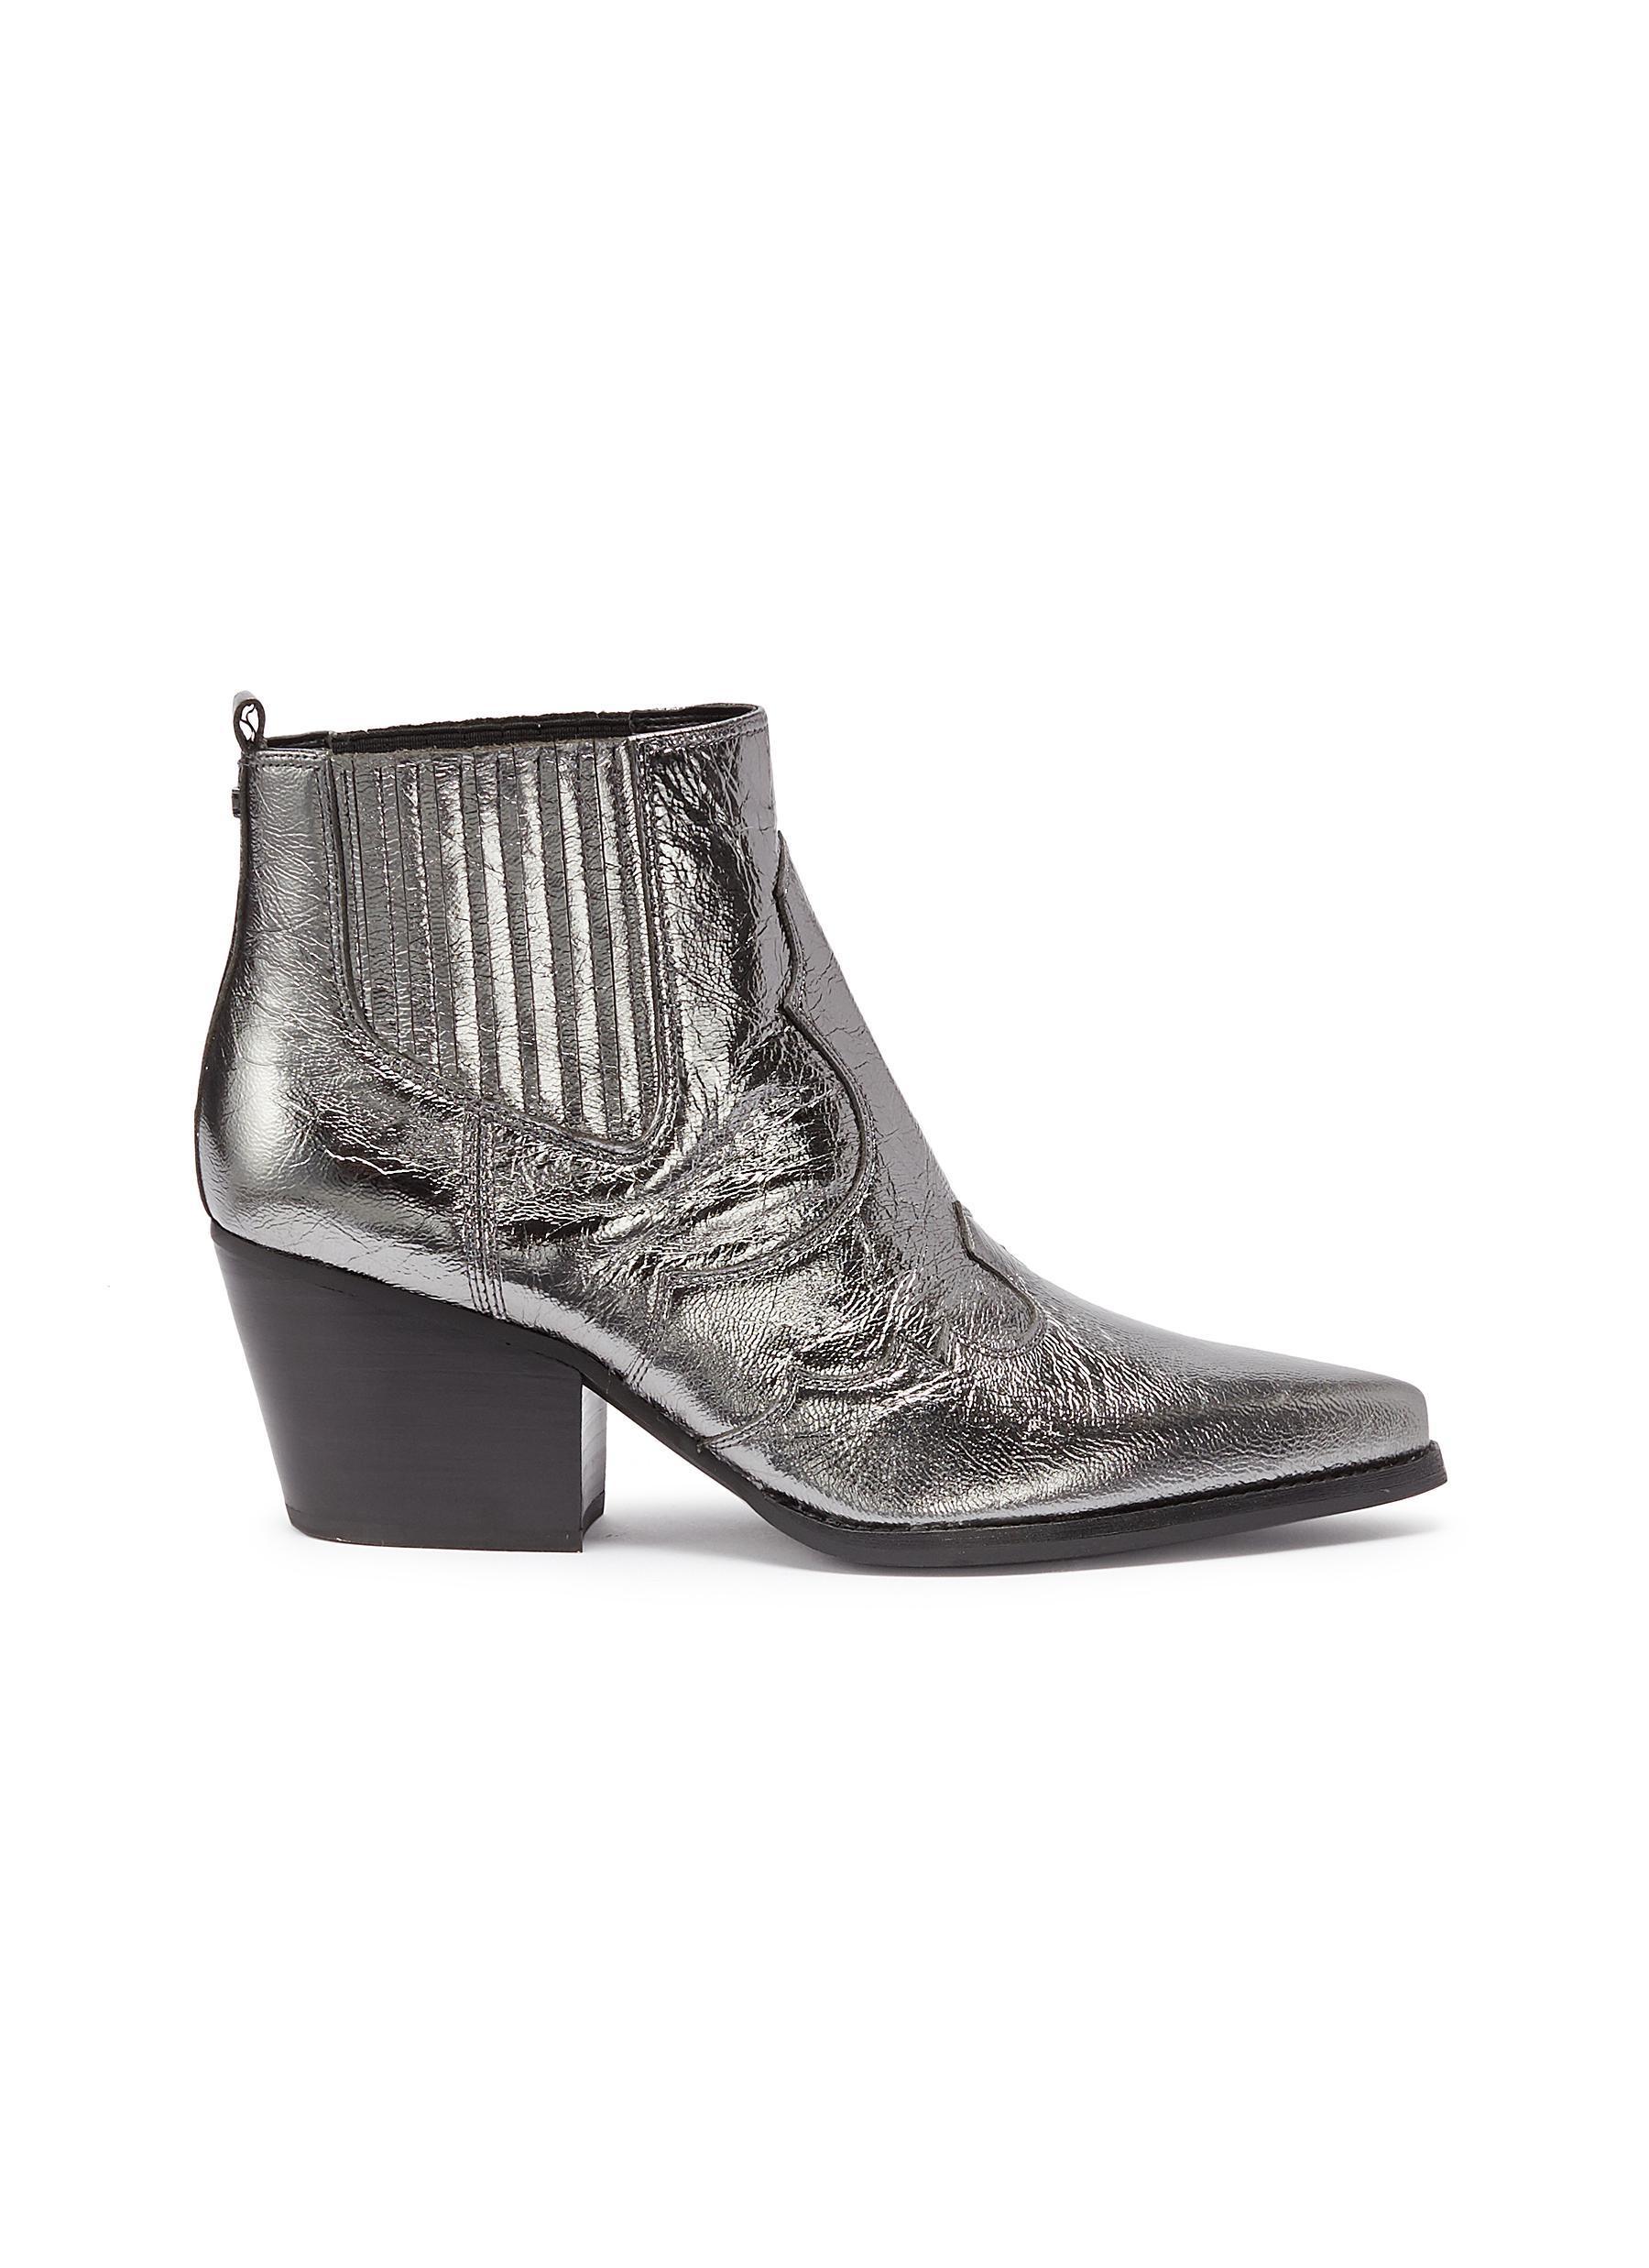 85ba8d7f9fb3df Sam Edelman Metallic-leather Cowboy Boots in Metallic - Save 68% - Lyst